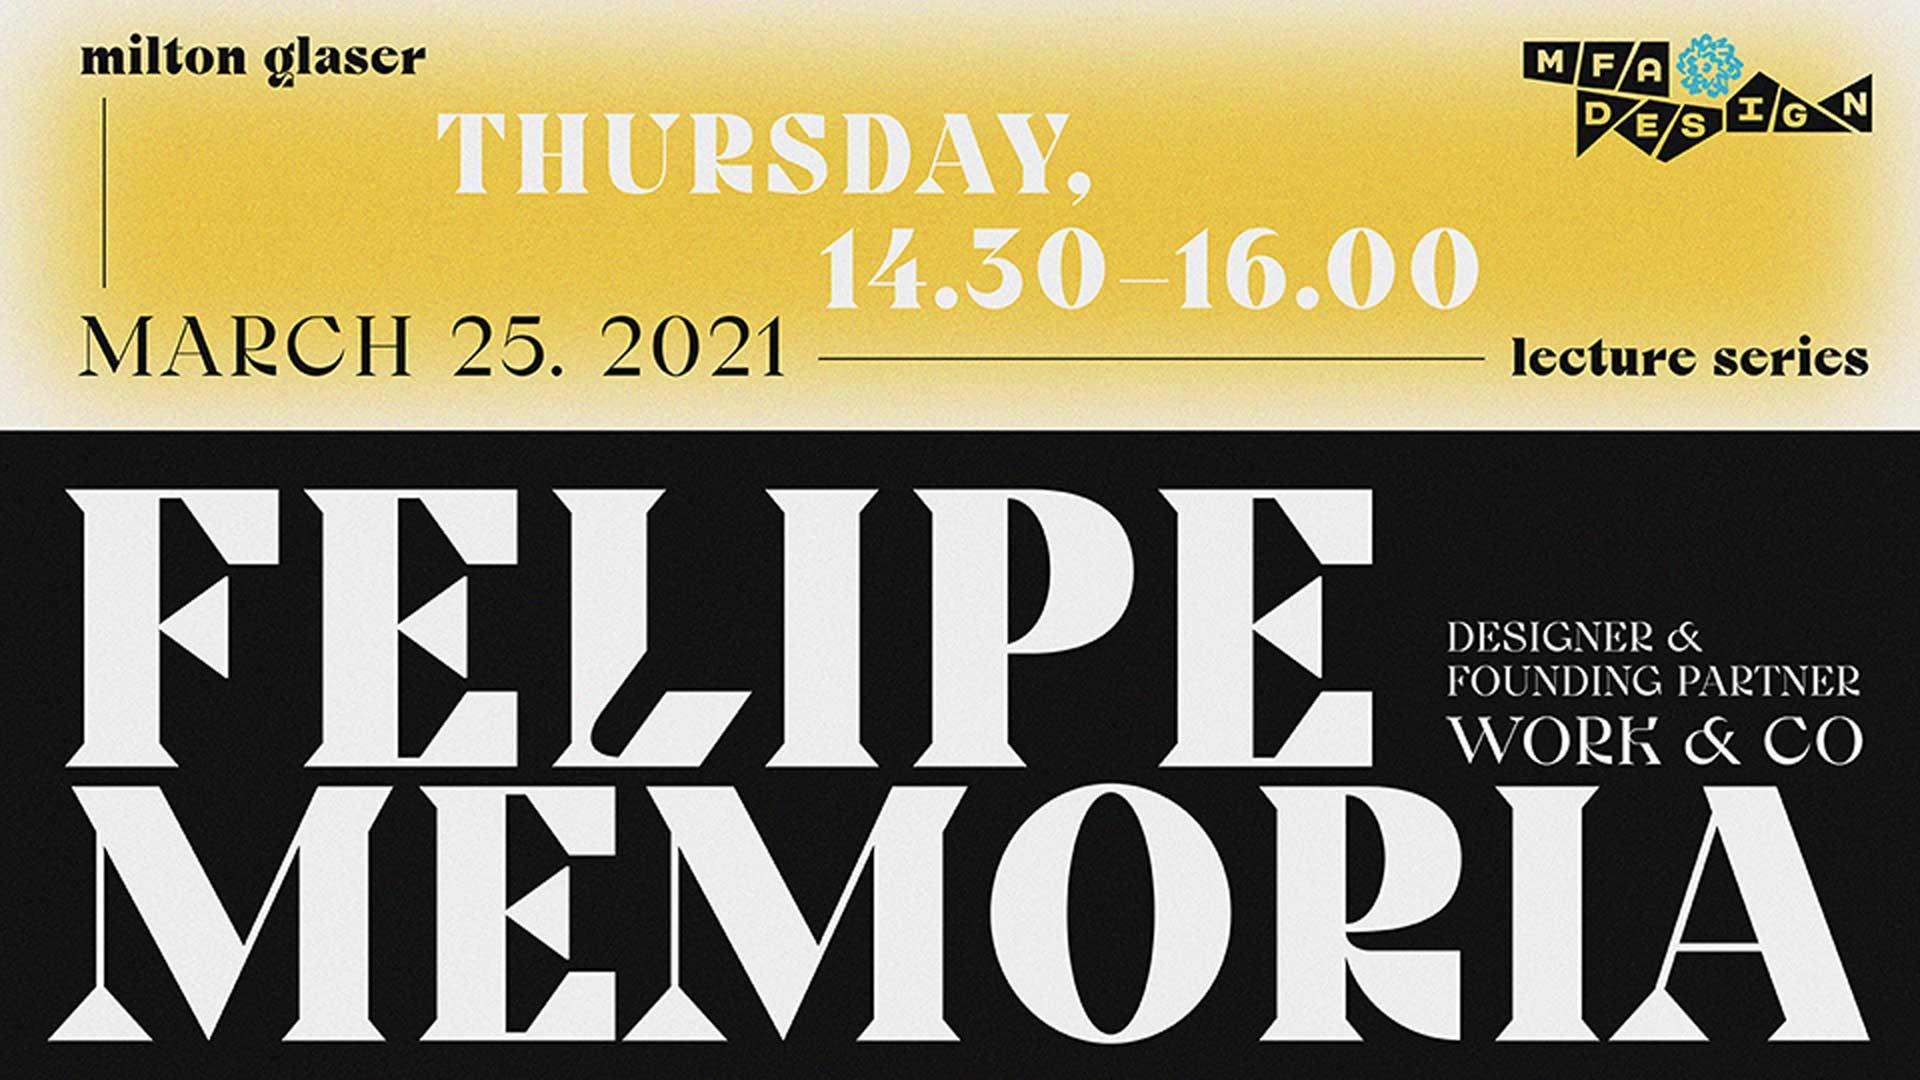 Felipe Memoria guest lecture announcement graphic